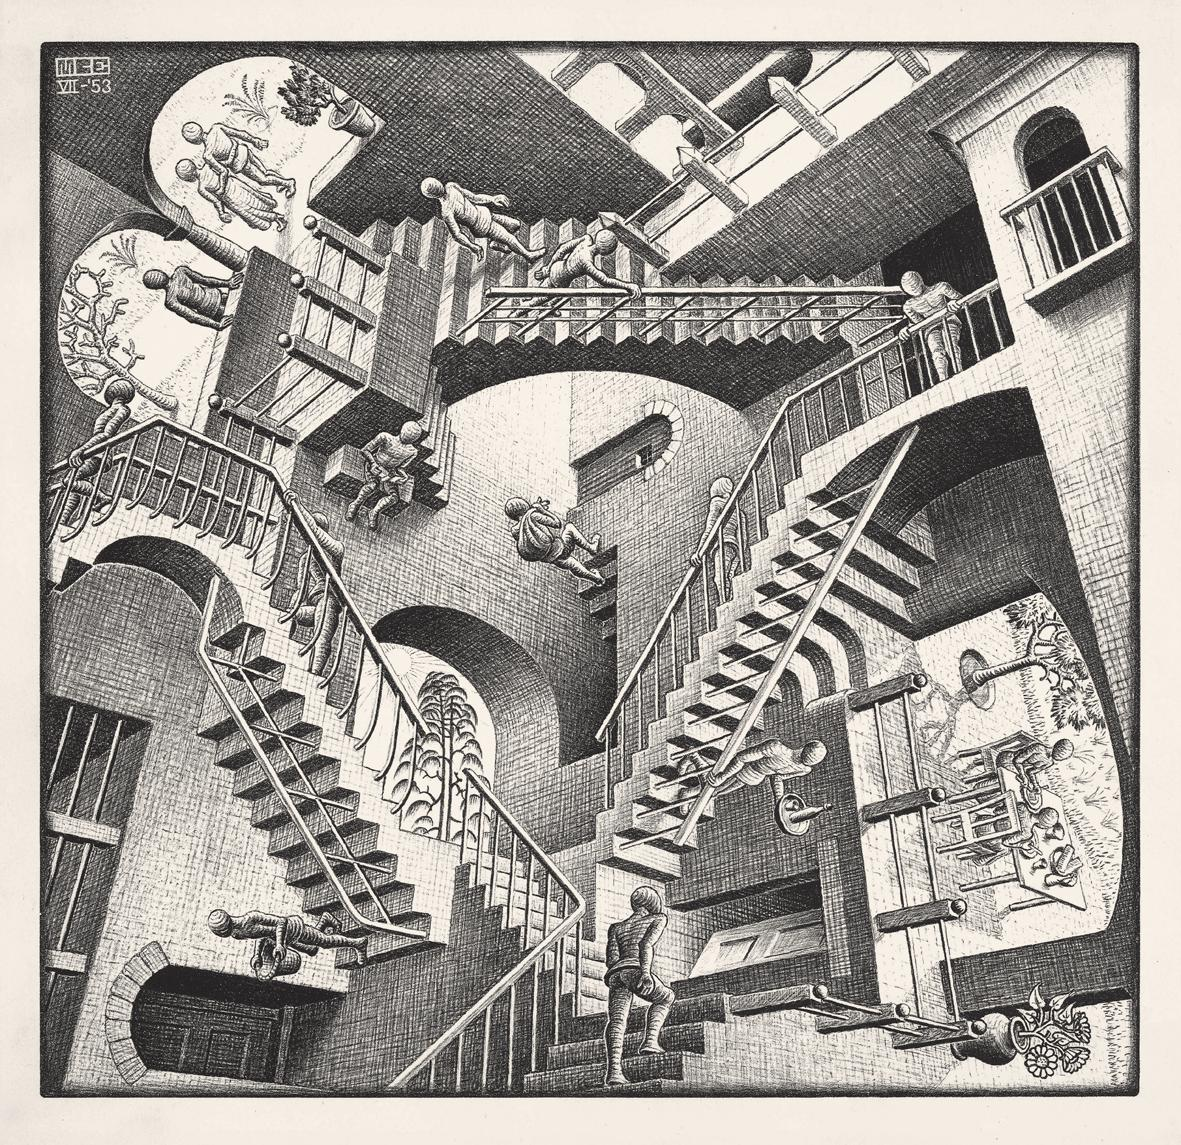 [Image: 389-Relativity-1953-Lithographm.jpg]